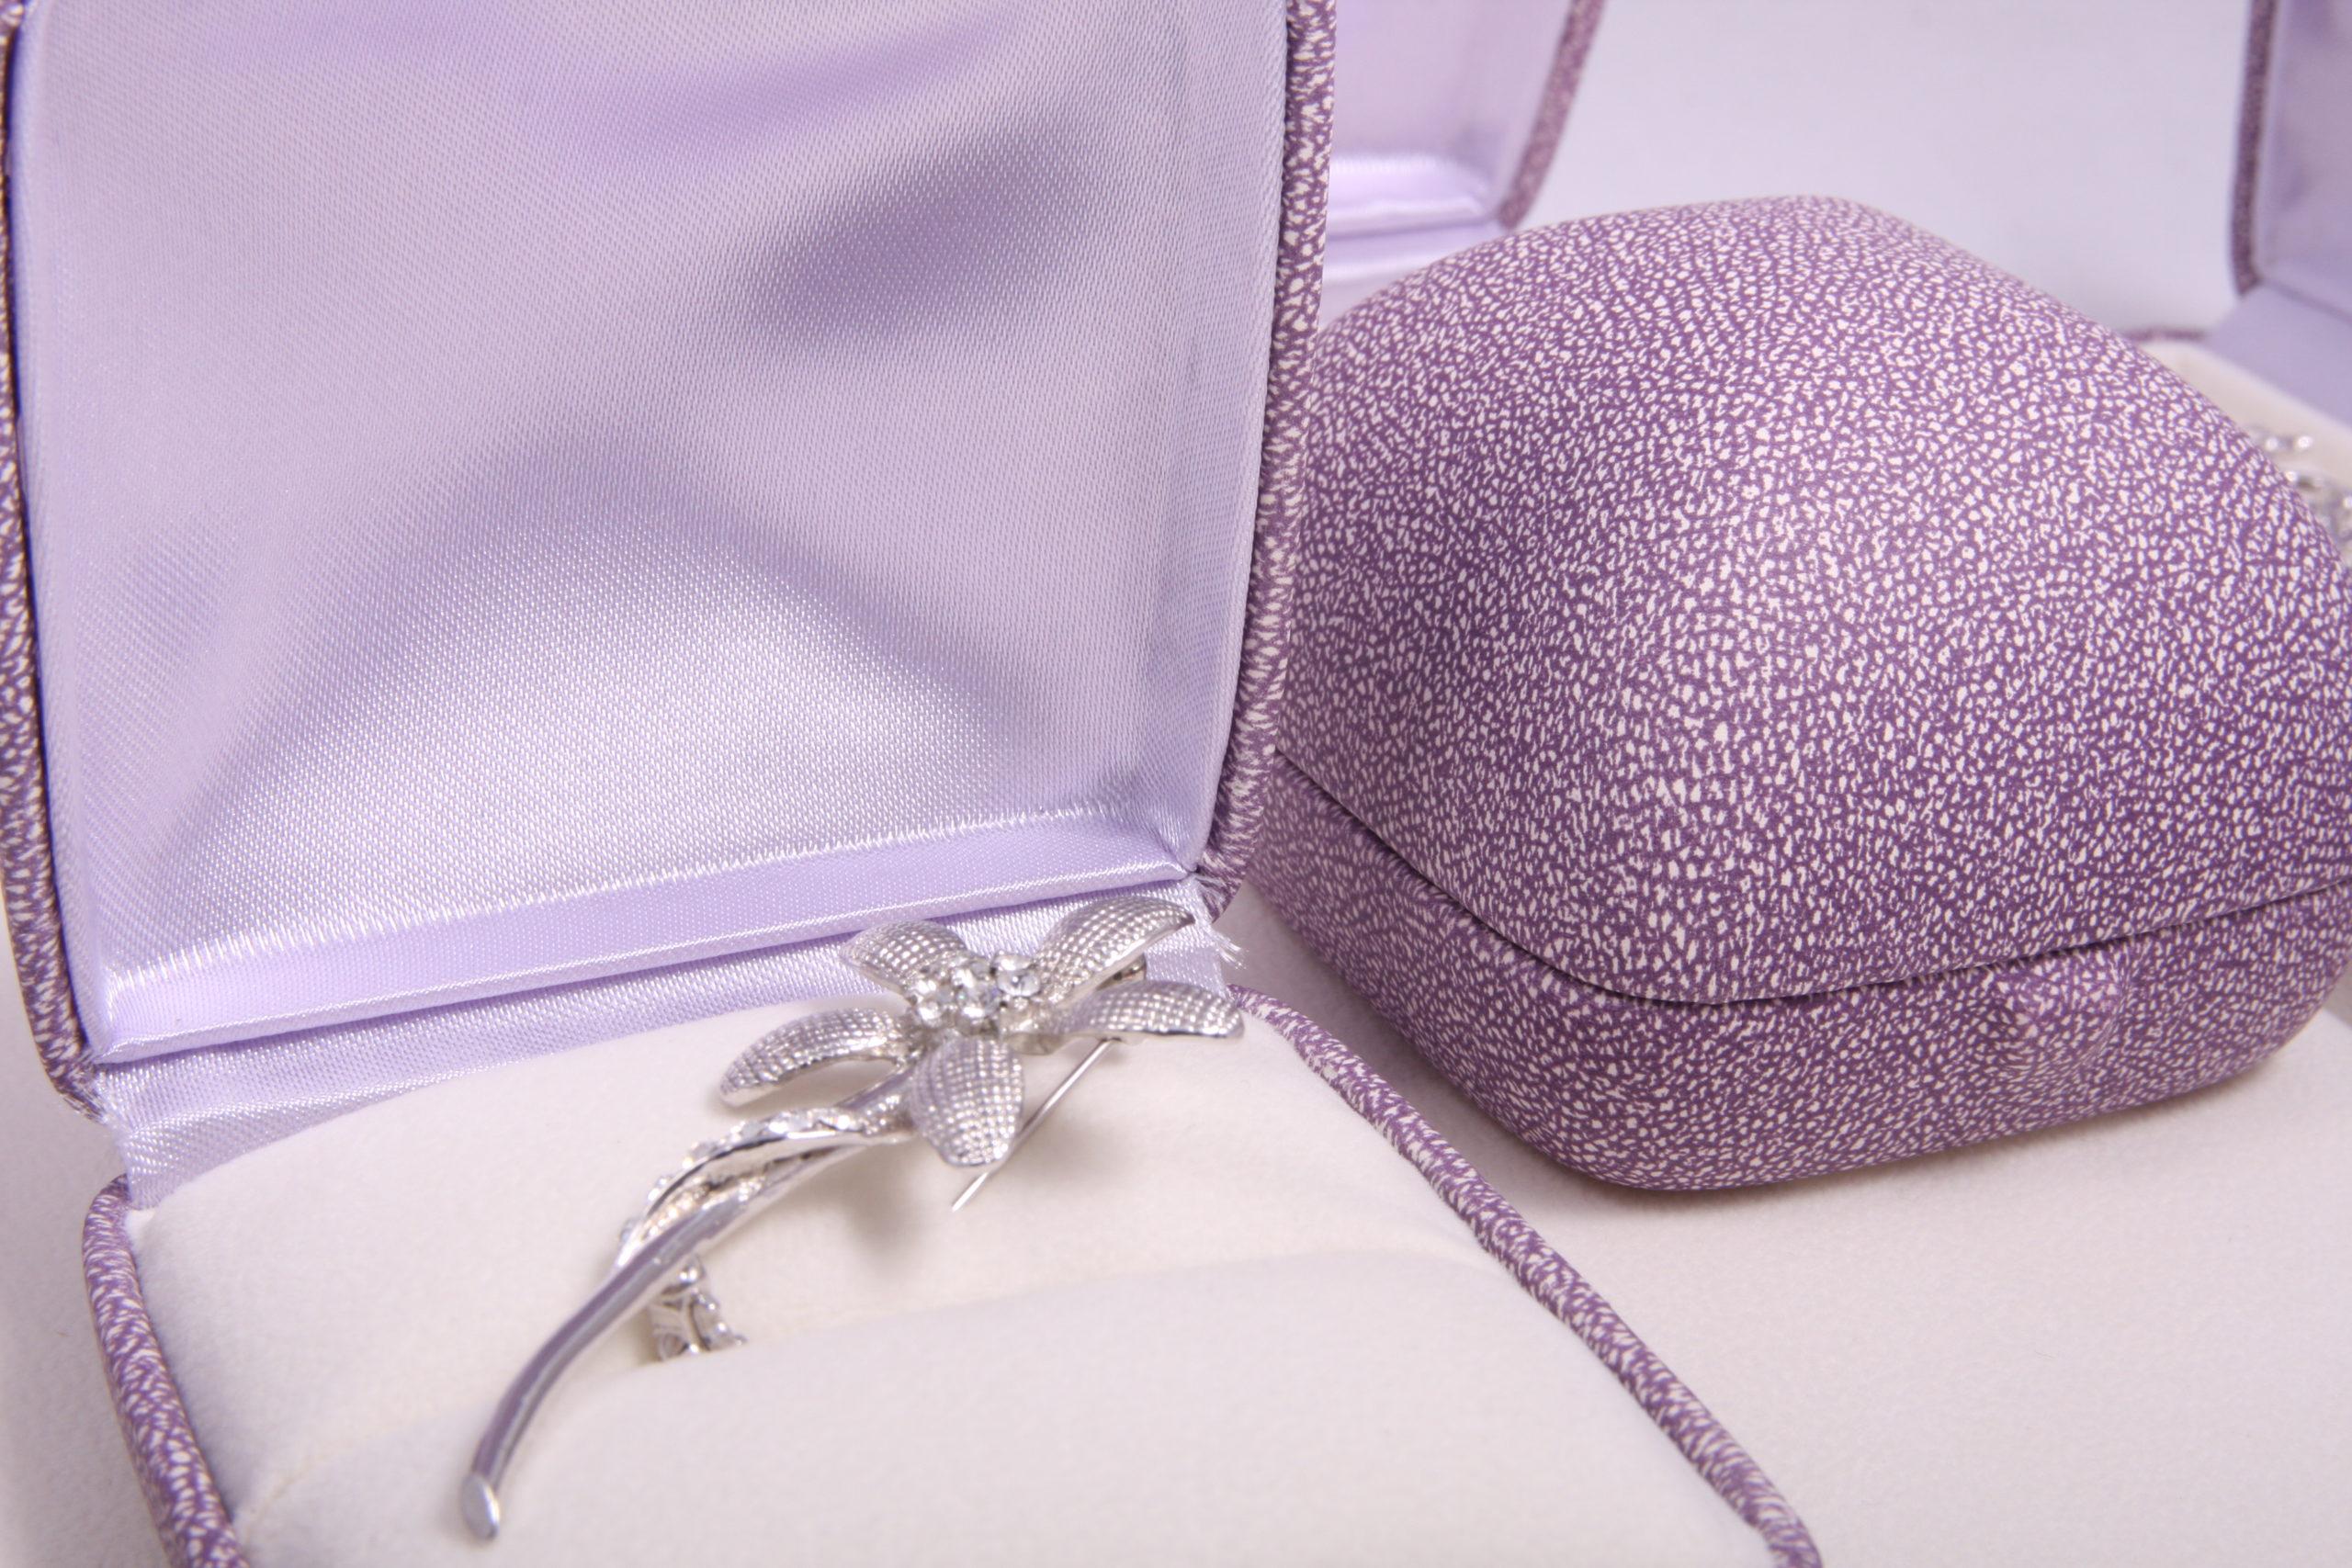 Glorybox - Jewellery Box